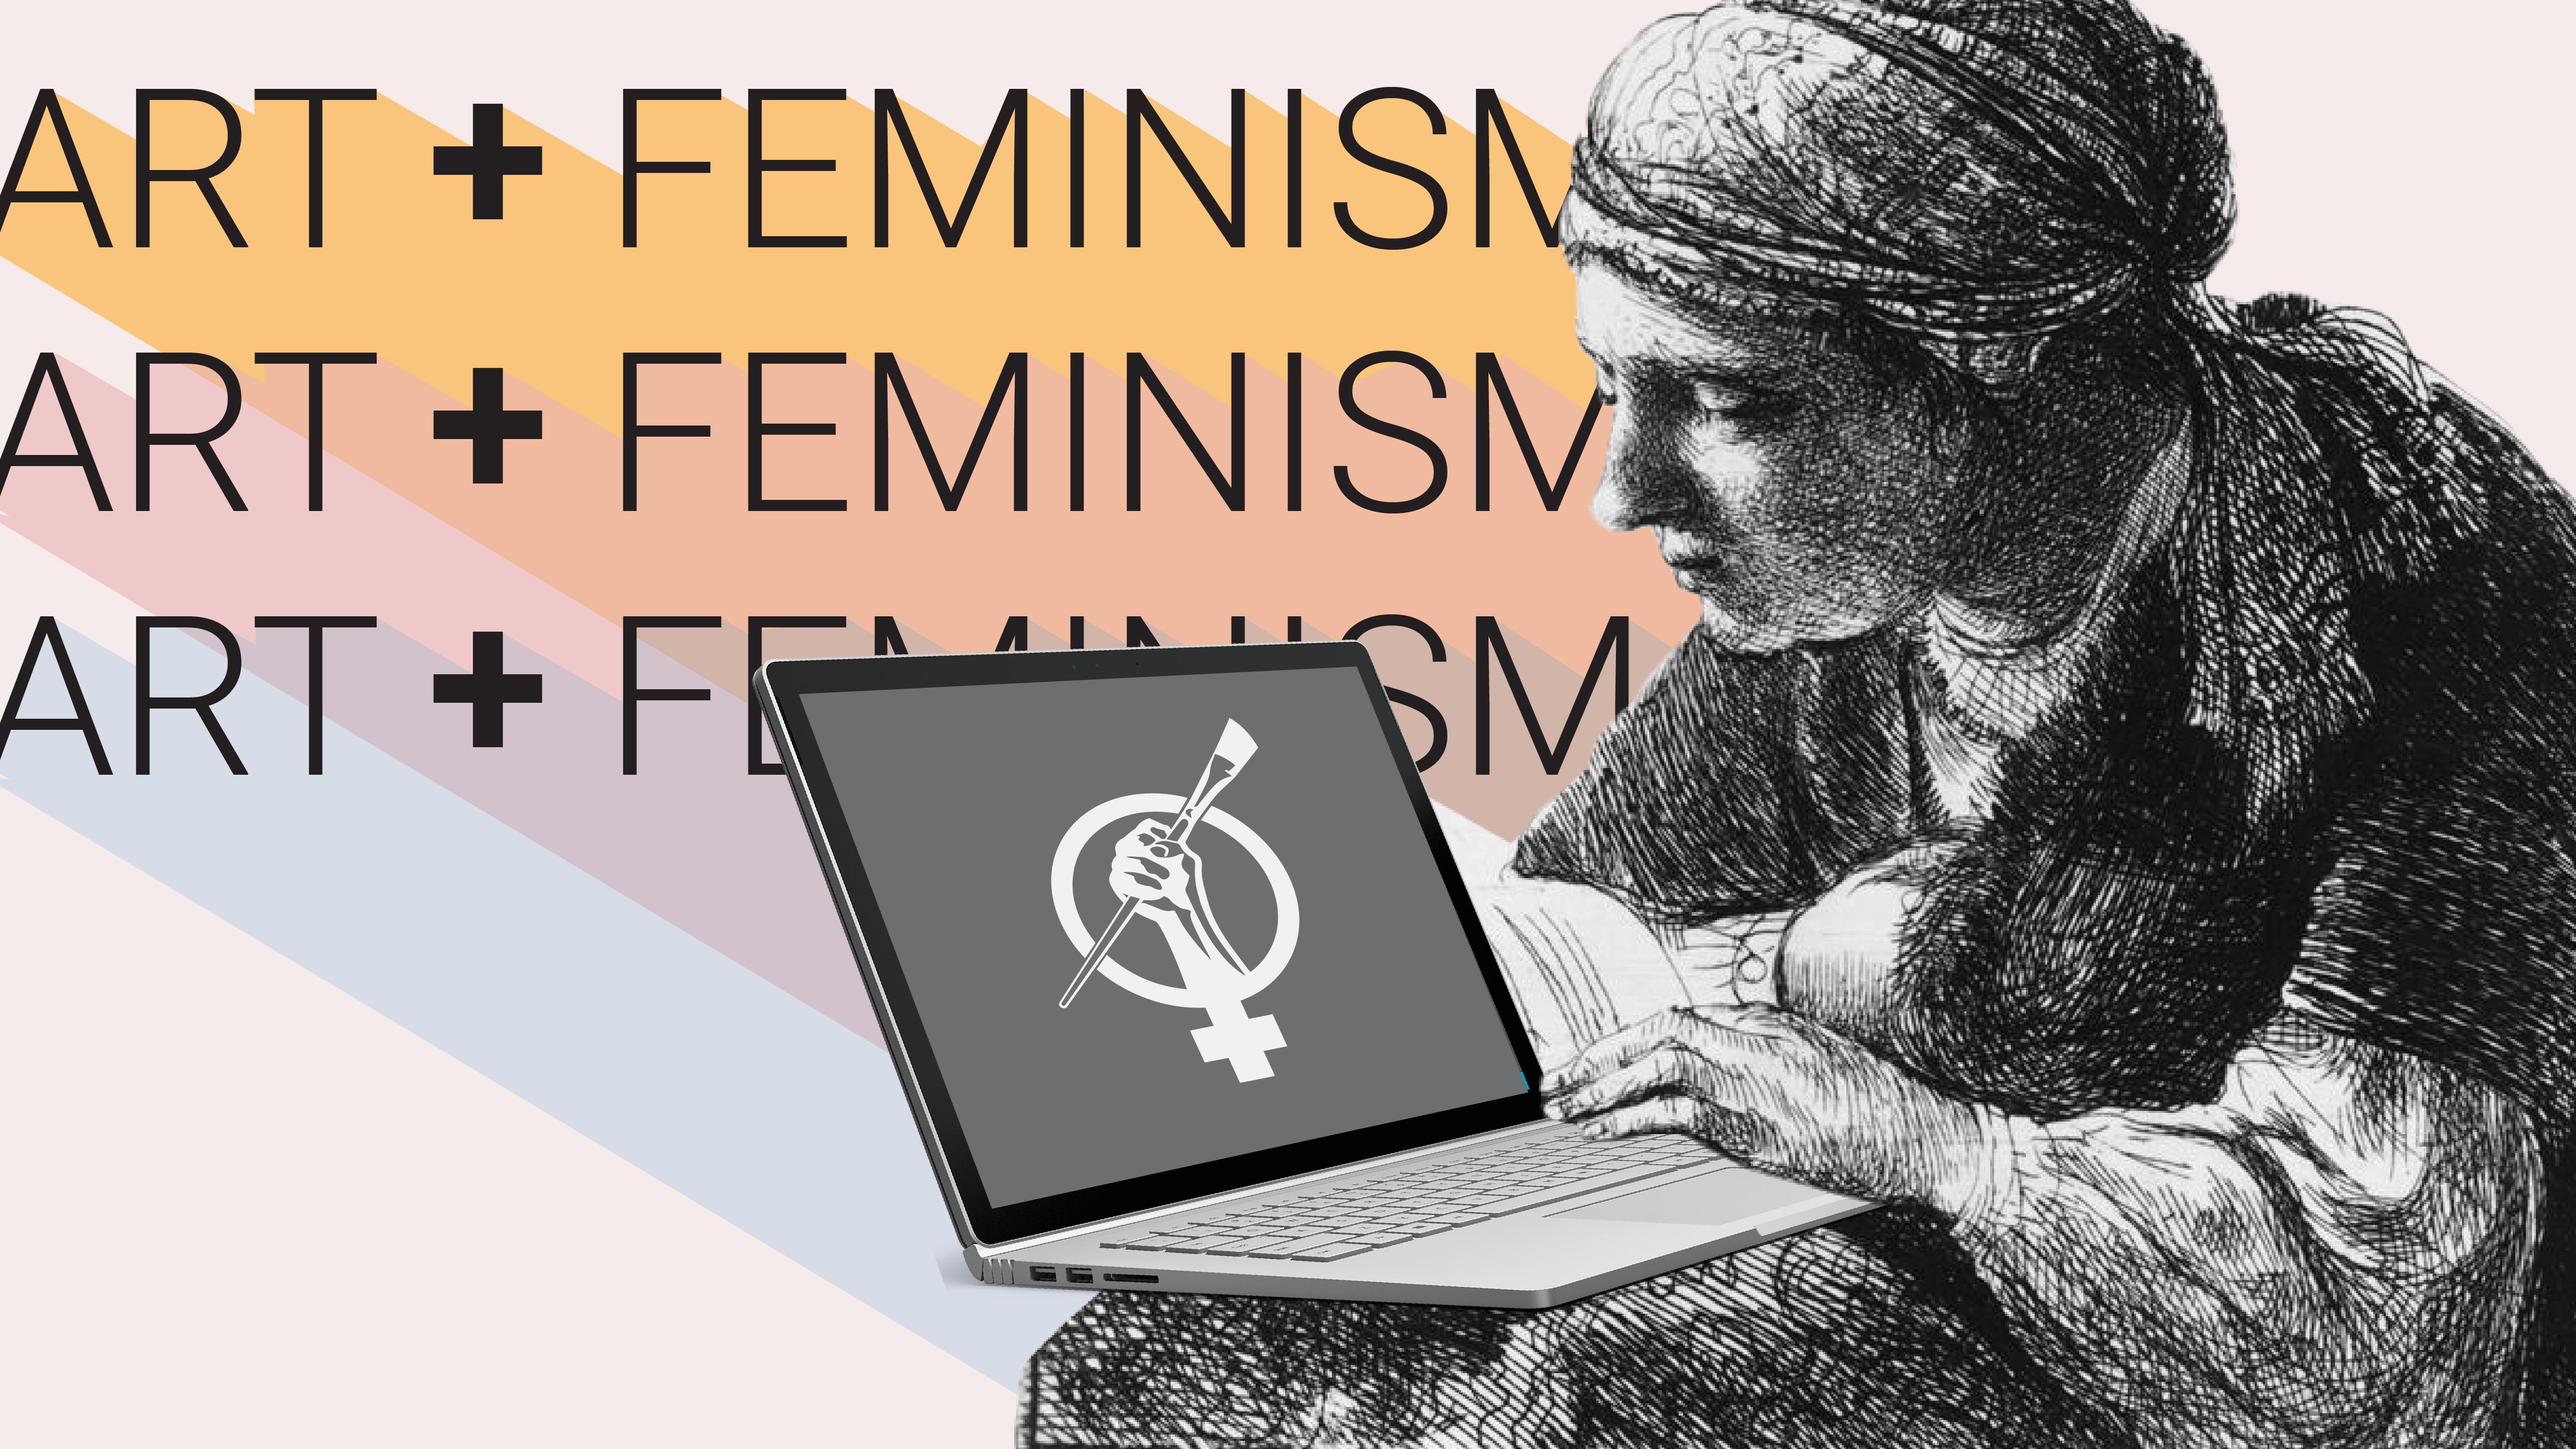 March 4: Wikipedia Edit-a-thon: Art + Feminism